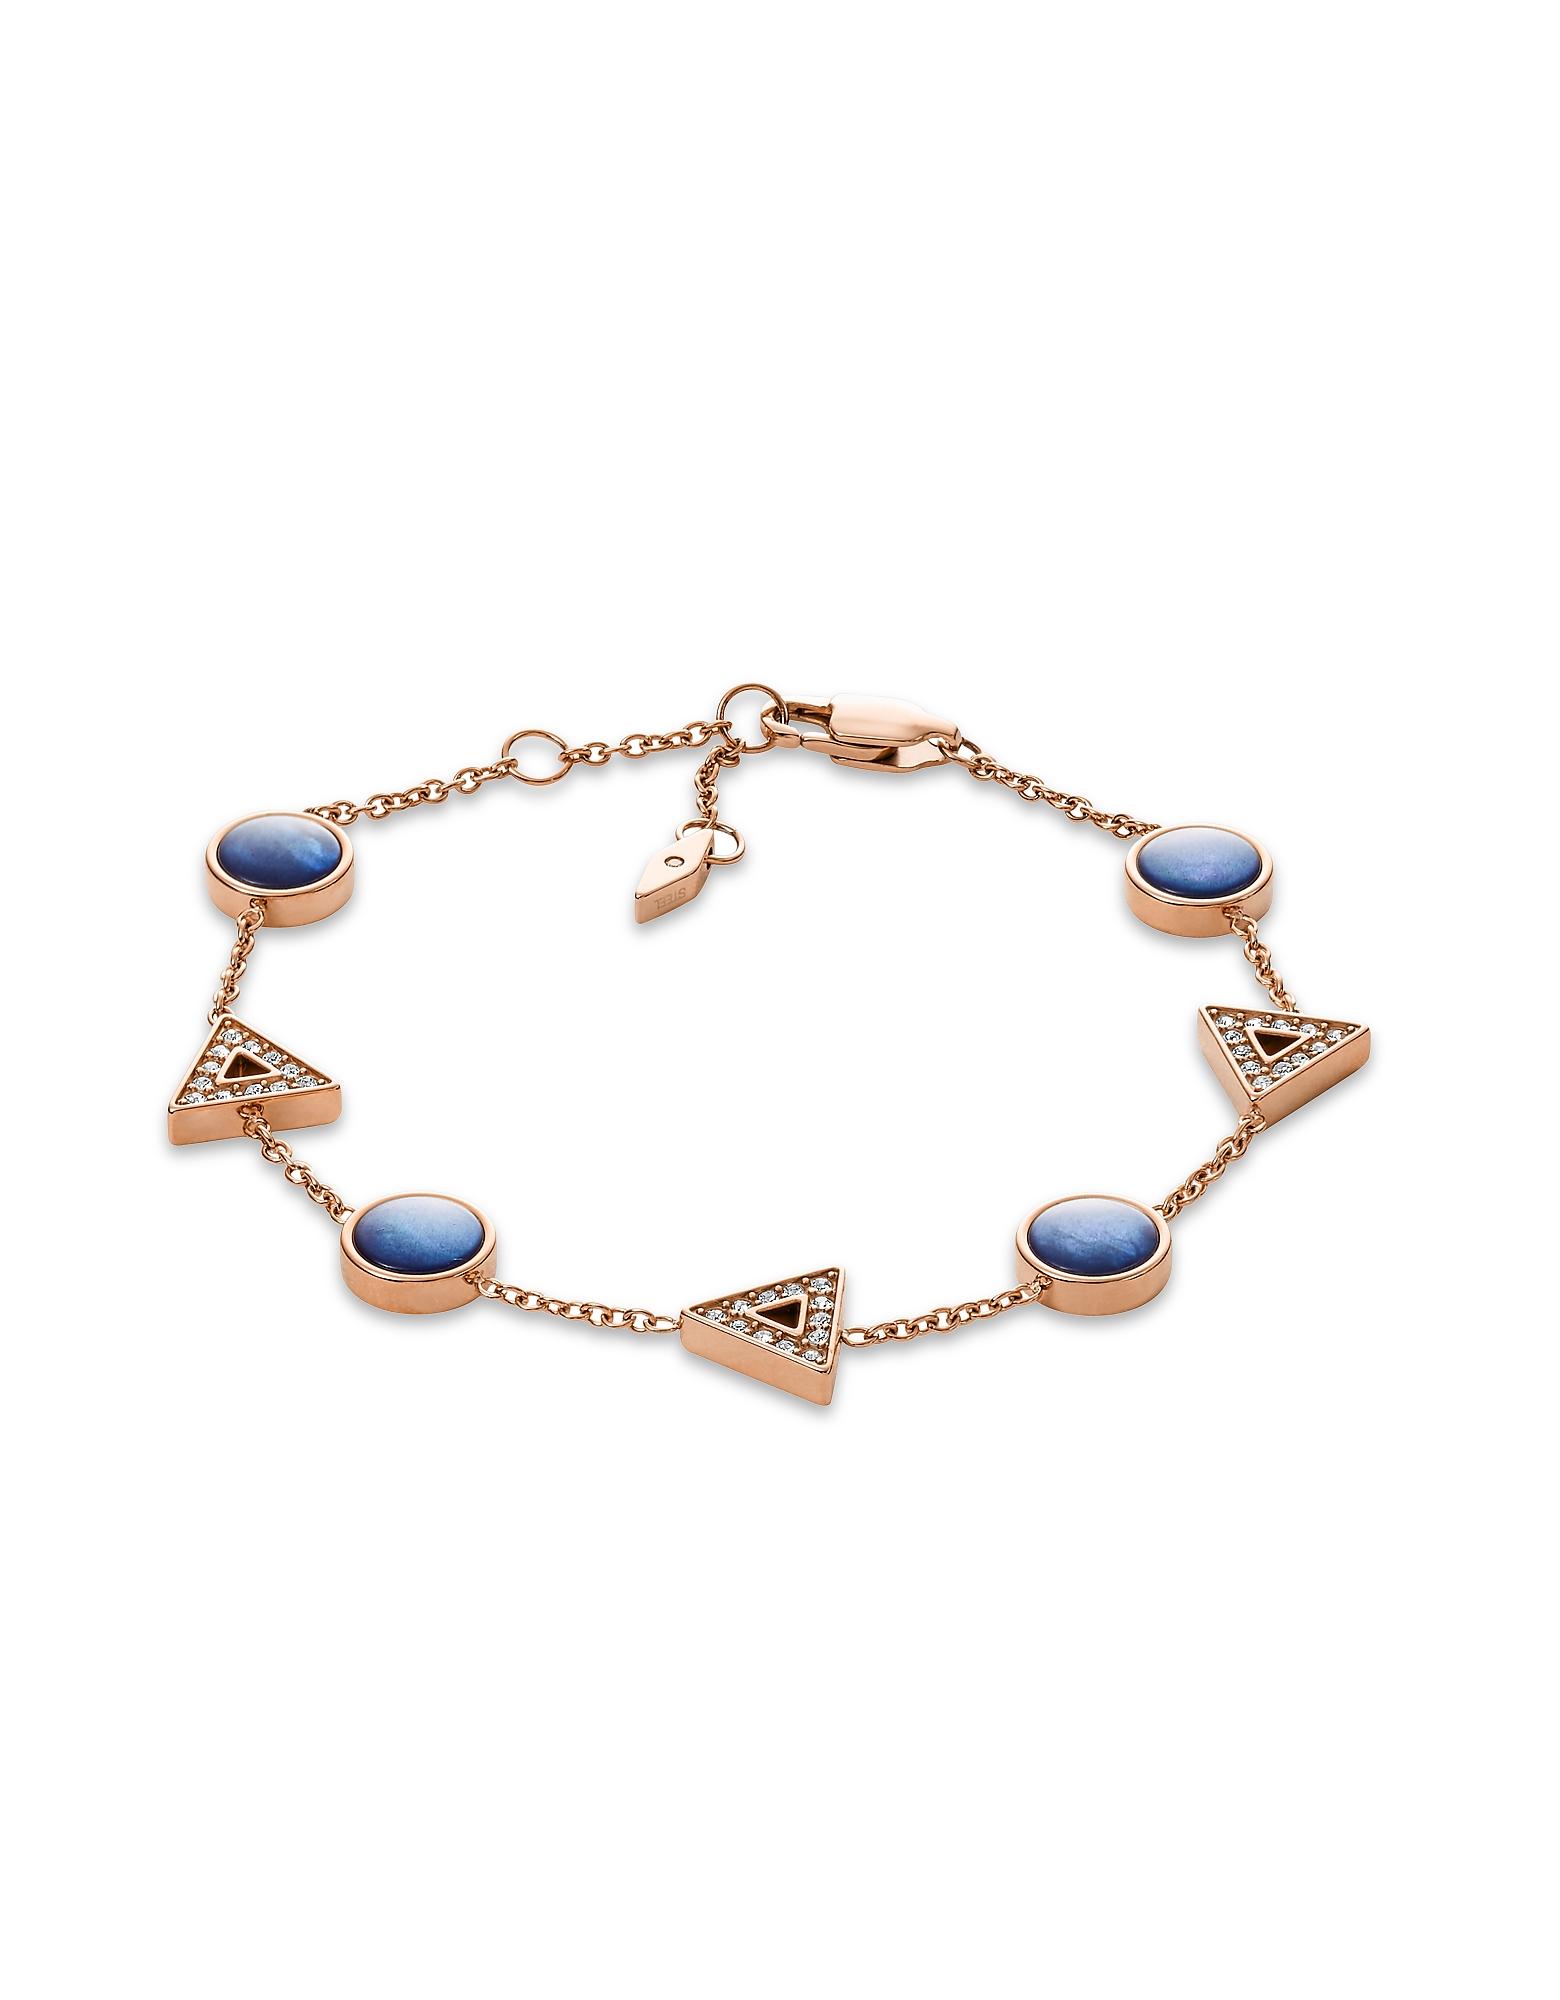 Fossil Bracelets, JF03012791 Classics Women's Bracelet